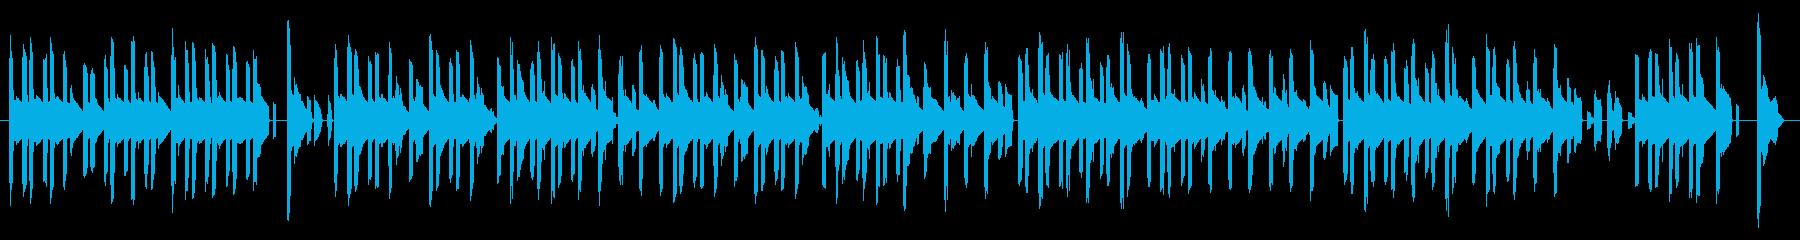 GB風パズル・カードゲームのタイトル曲の再生済みの波形